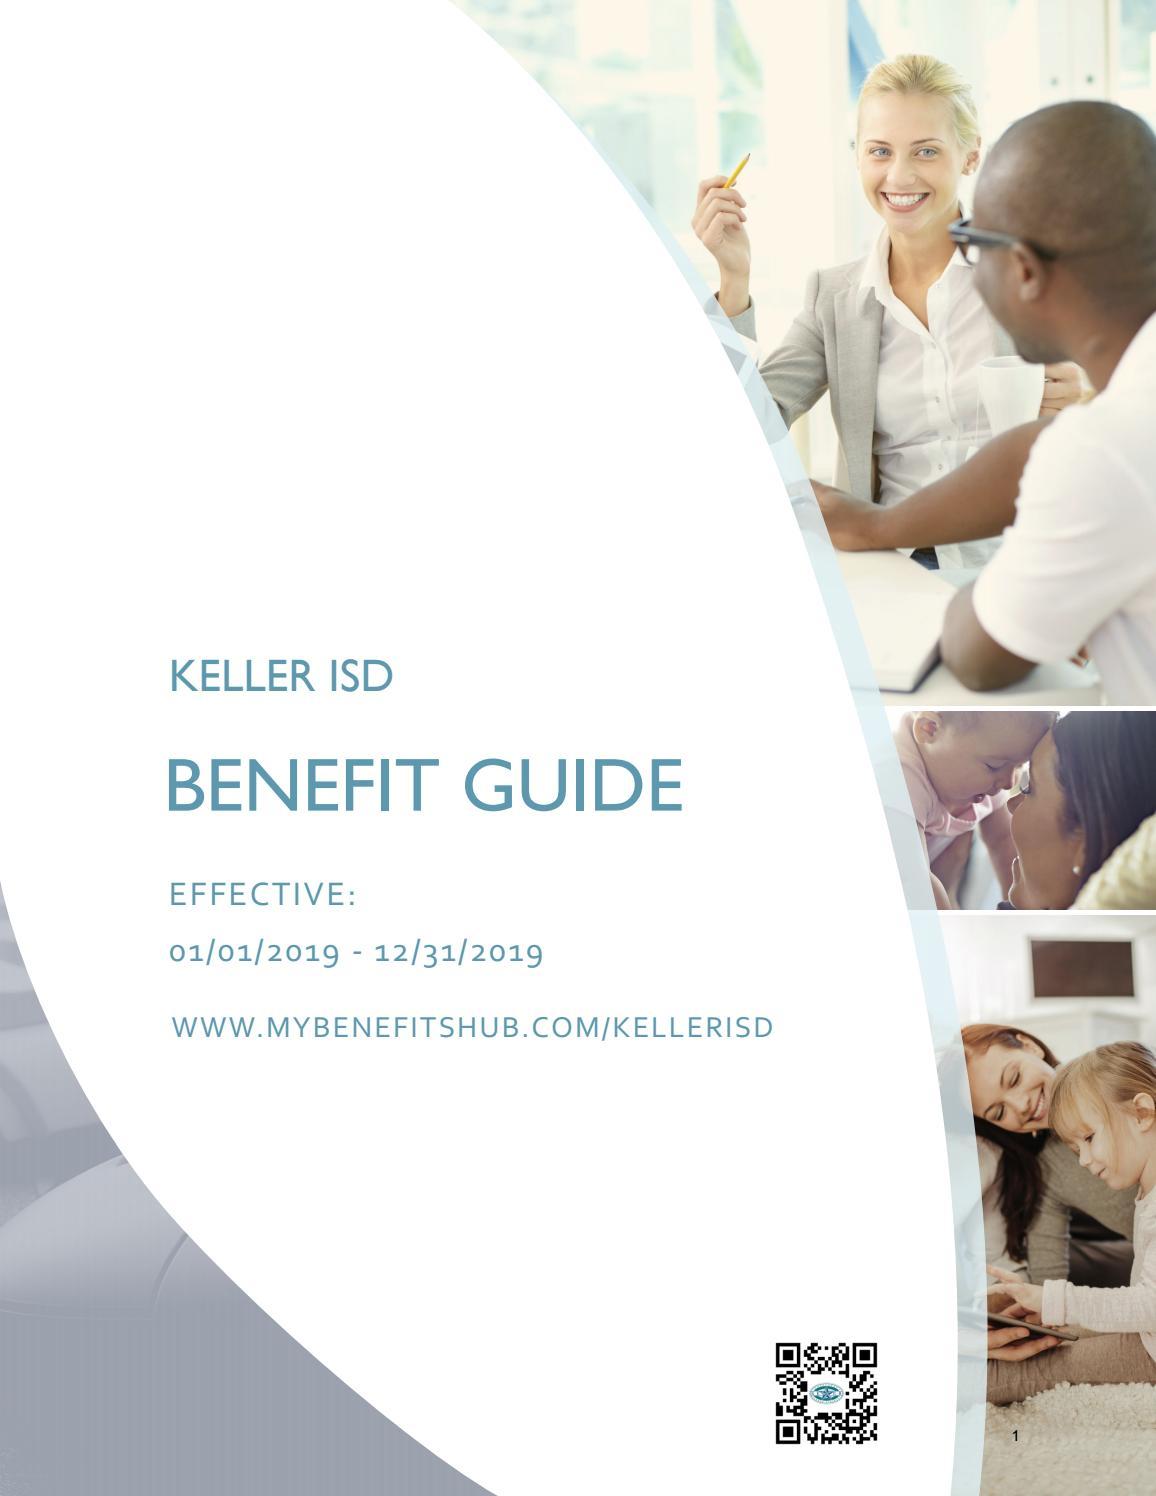 2019 Keller ISD Benefit Guide by FBS - Issuu